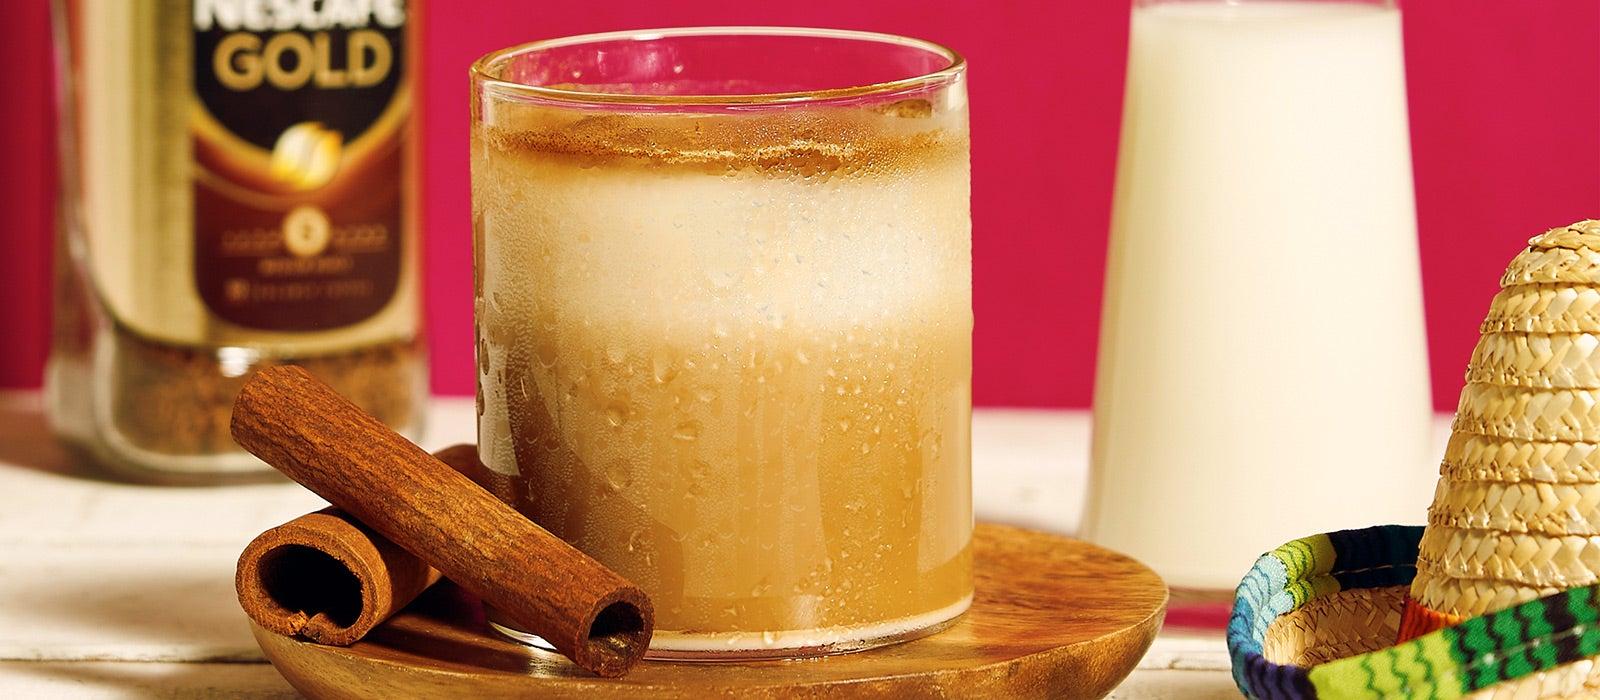 nescafe-gold-Iced-Dirty-Horchata-recipe-banner_1.jpg